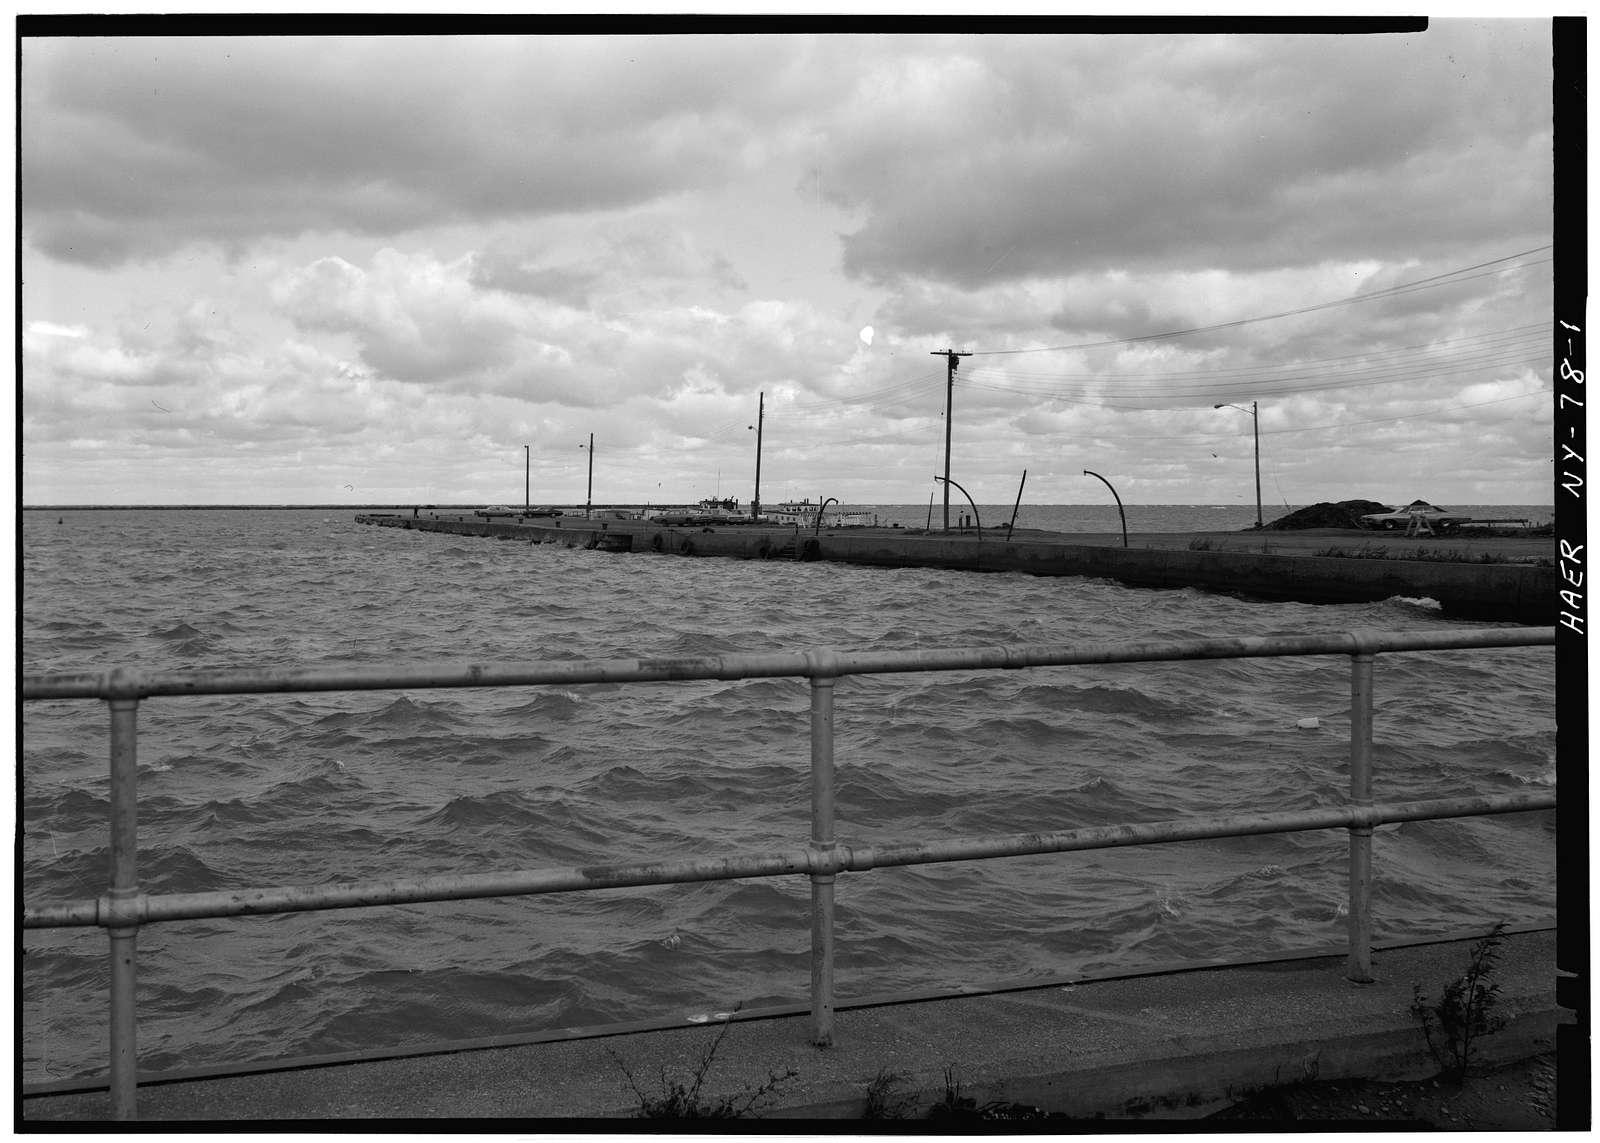 Erie Railway, Central Avenue Pier, Central Avenue, Dunkirk, Chautauqua County, NY